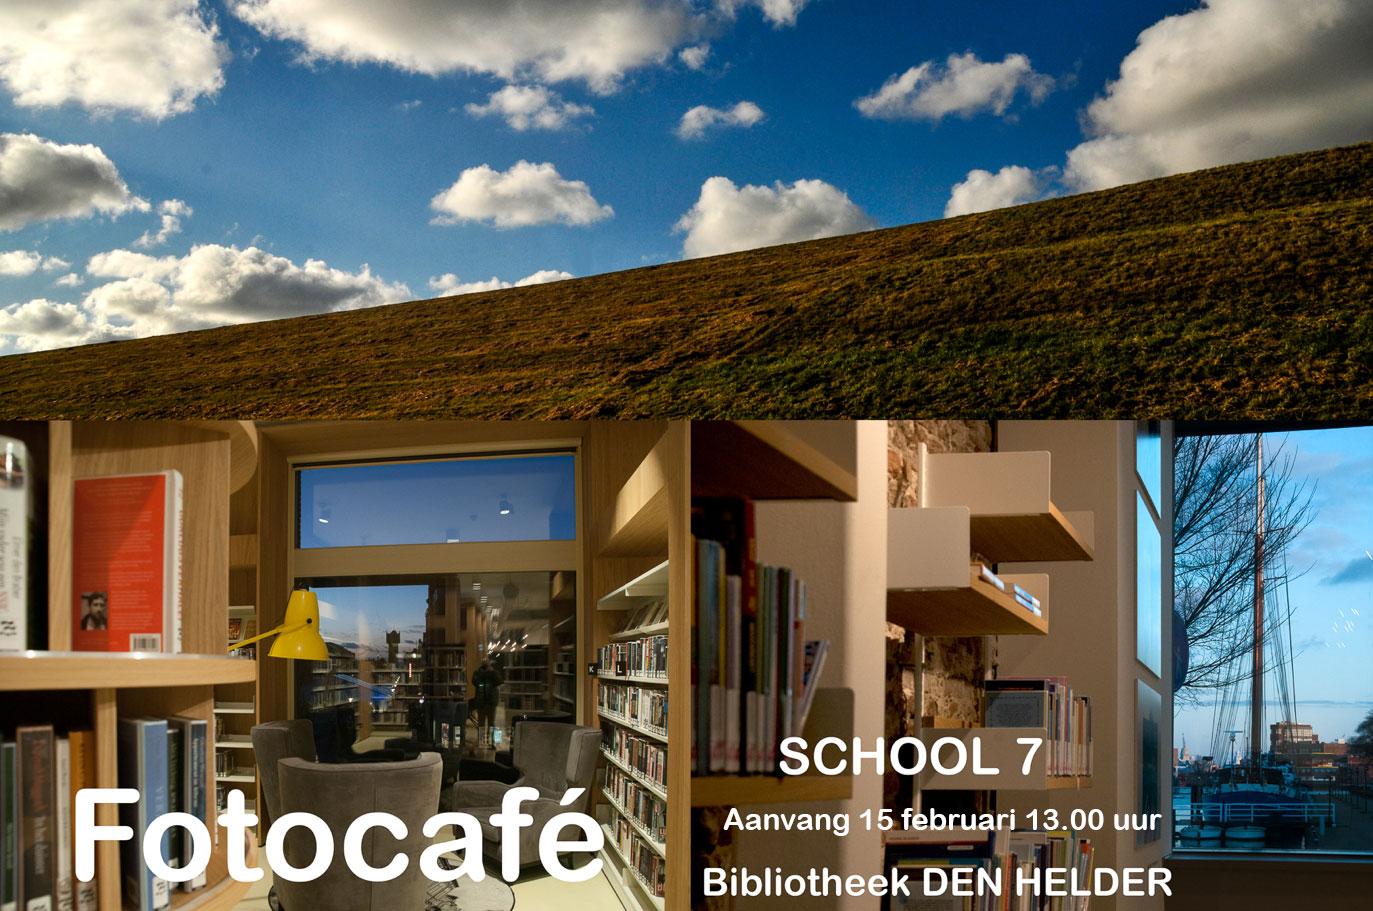 fotocafe-school-7-2